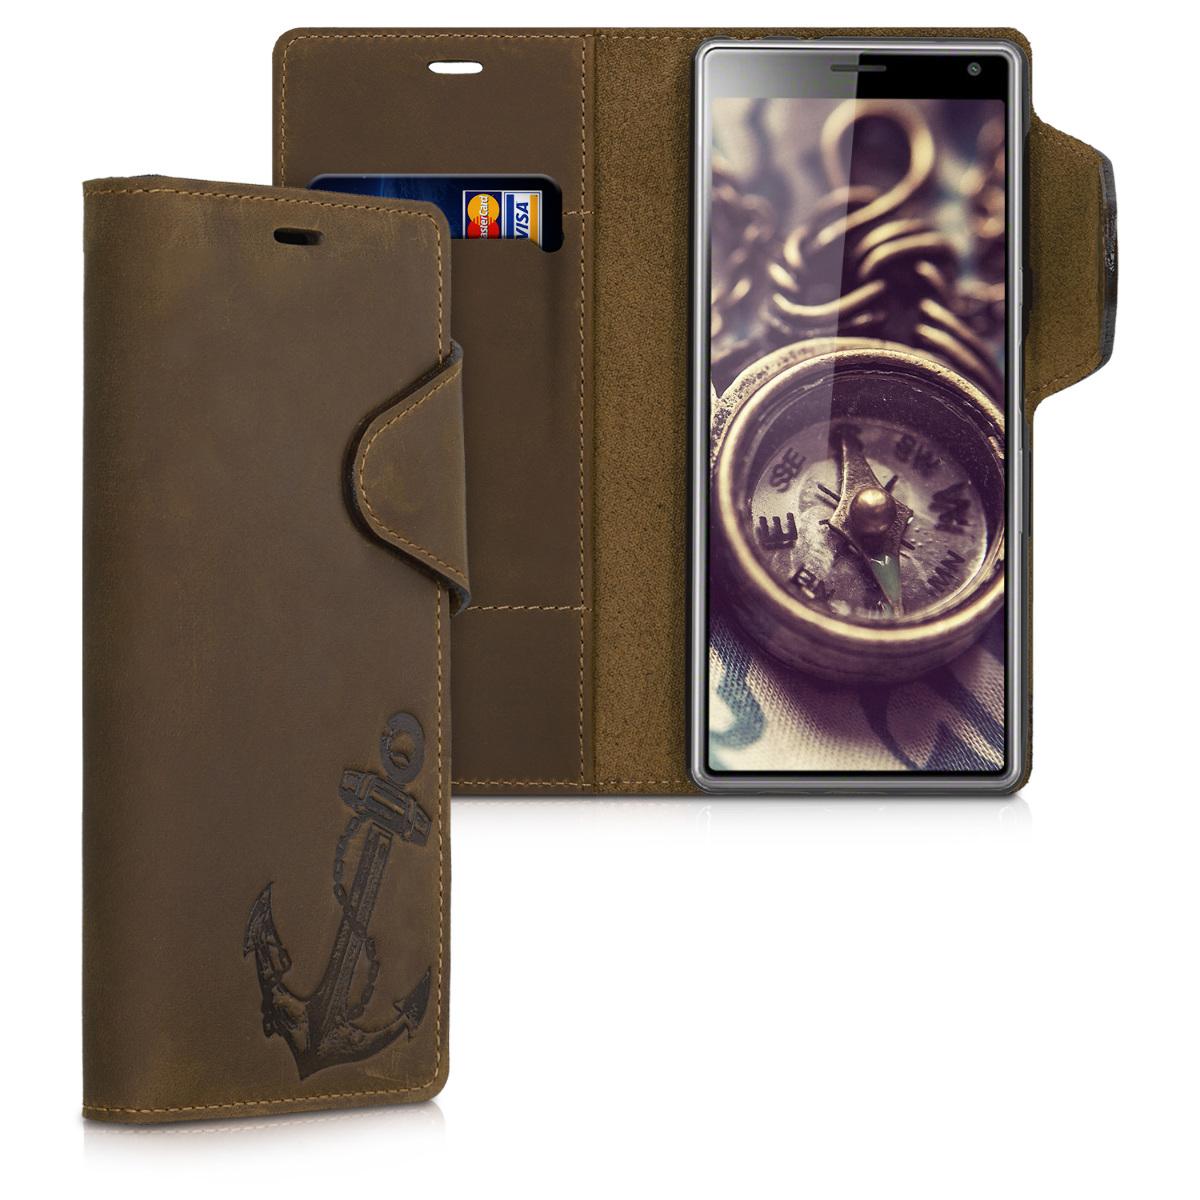 Kalibri Δερμάτινη Suede Θήκη - Πορτοφόλι Sony Xperia 10 - Brown (48773.02)